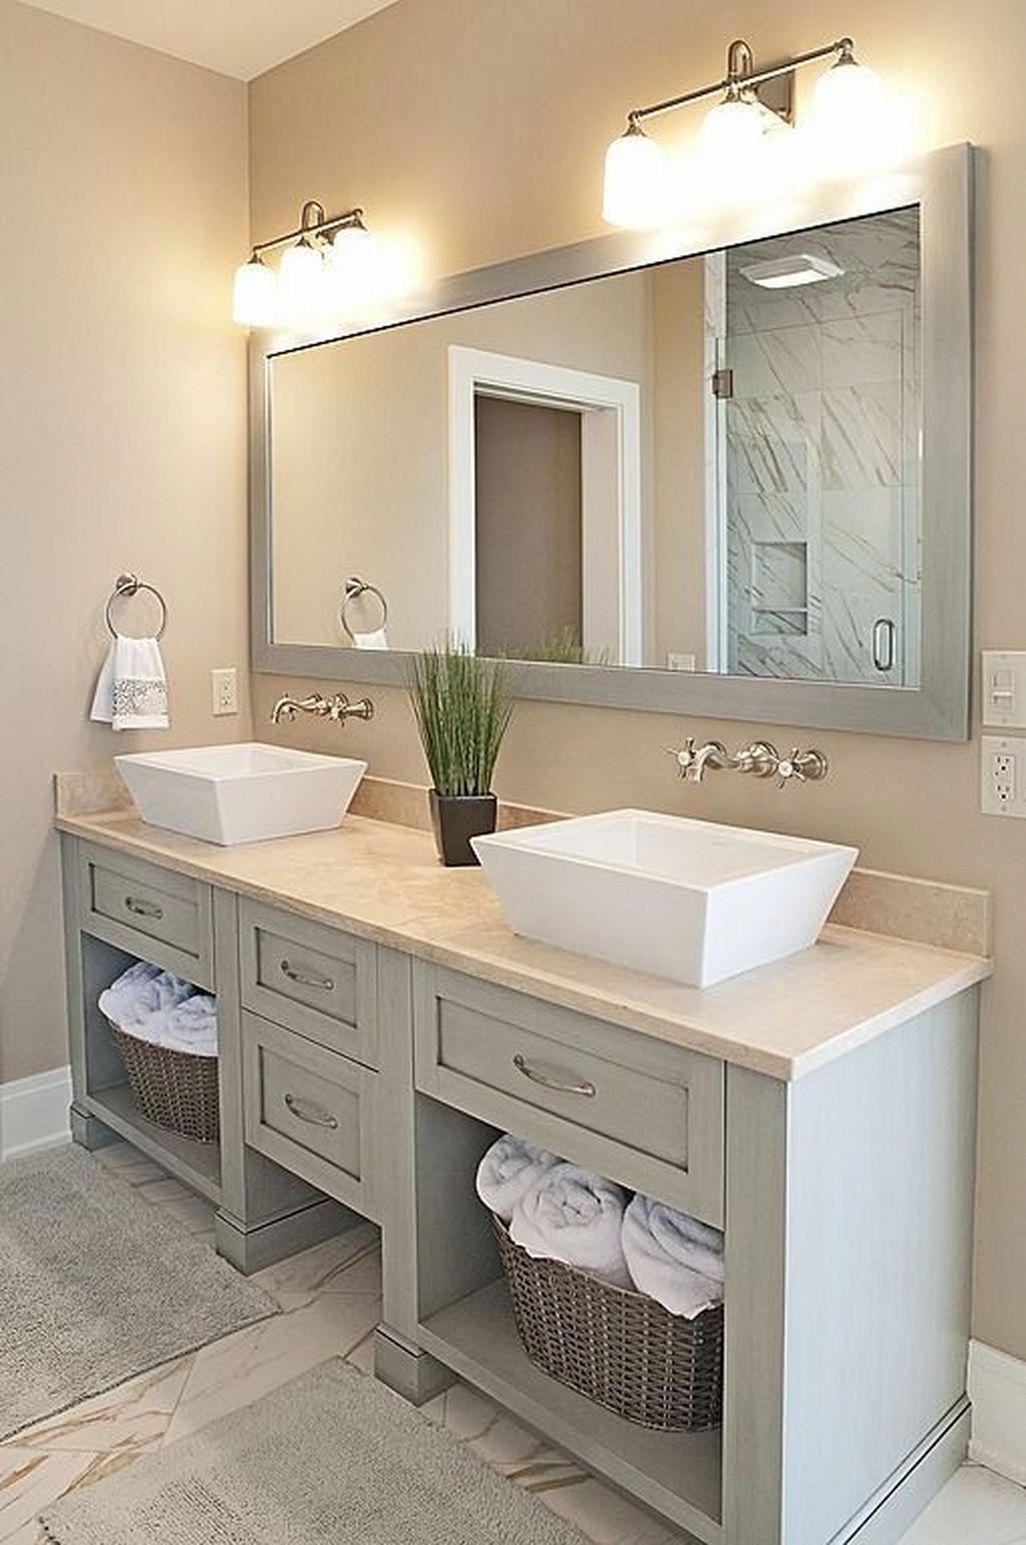 Pin On Bathroom Remodeling Ideas Small bathroom vanity ideas